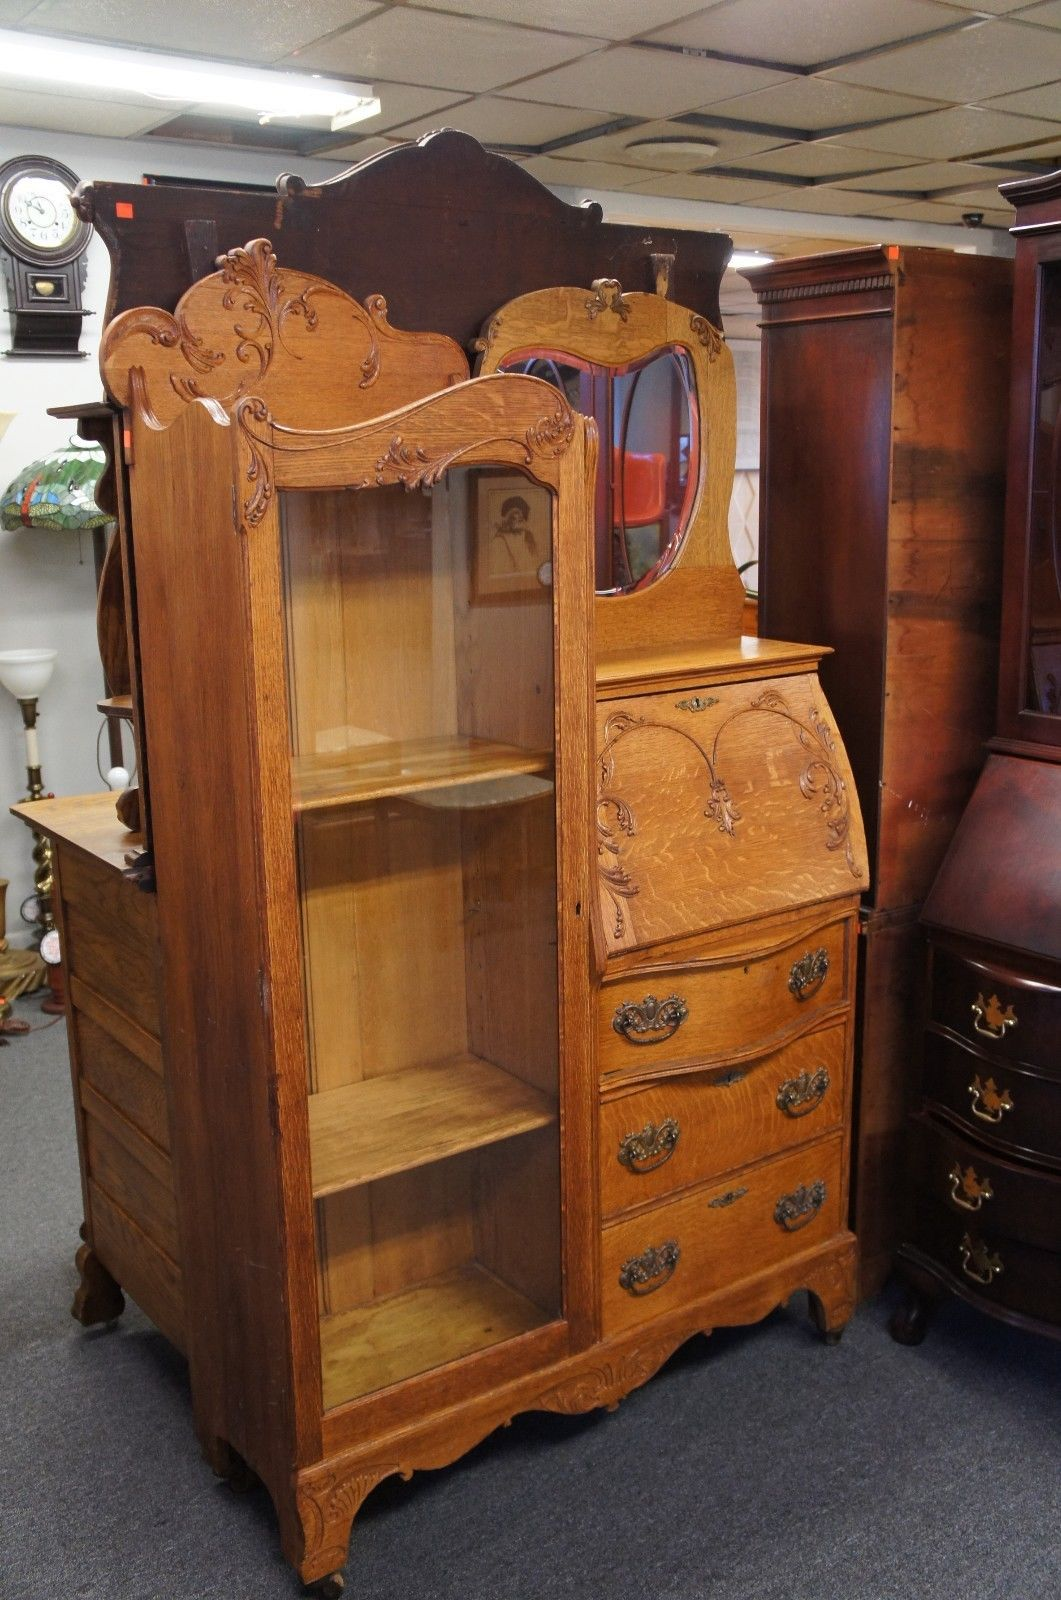 Early 20th C Antique Oak Larkin Secretary Desk & Bookcase Mirrored Arts +  Craft in Antiques, Furniture, Desks & Secretaries, 1900-1950 | eBay - Early 20th C Antique Oak Larkin Secretary Desk & Bookcase Mirrored